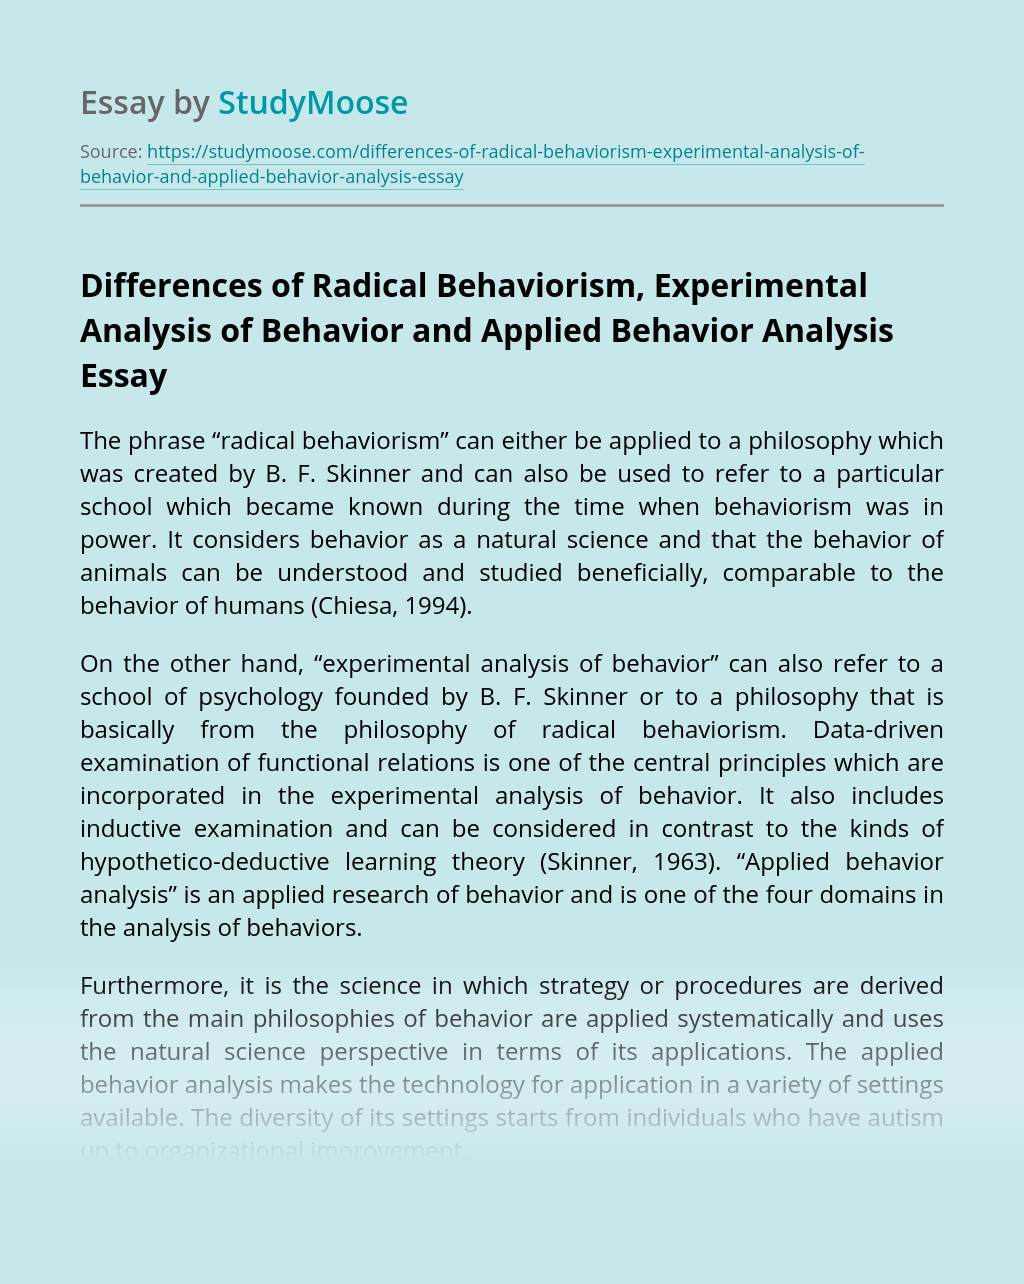 Differences of Radical Behaviorism, Experimental Analysis of Behavior and Applied Behavior Analysis